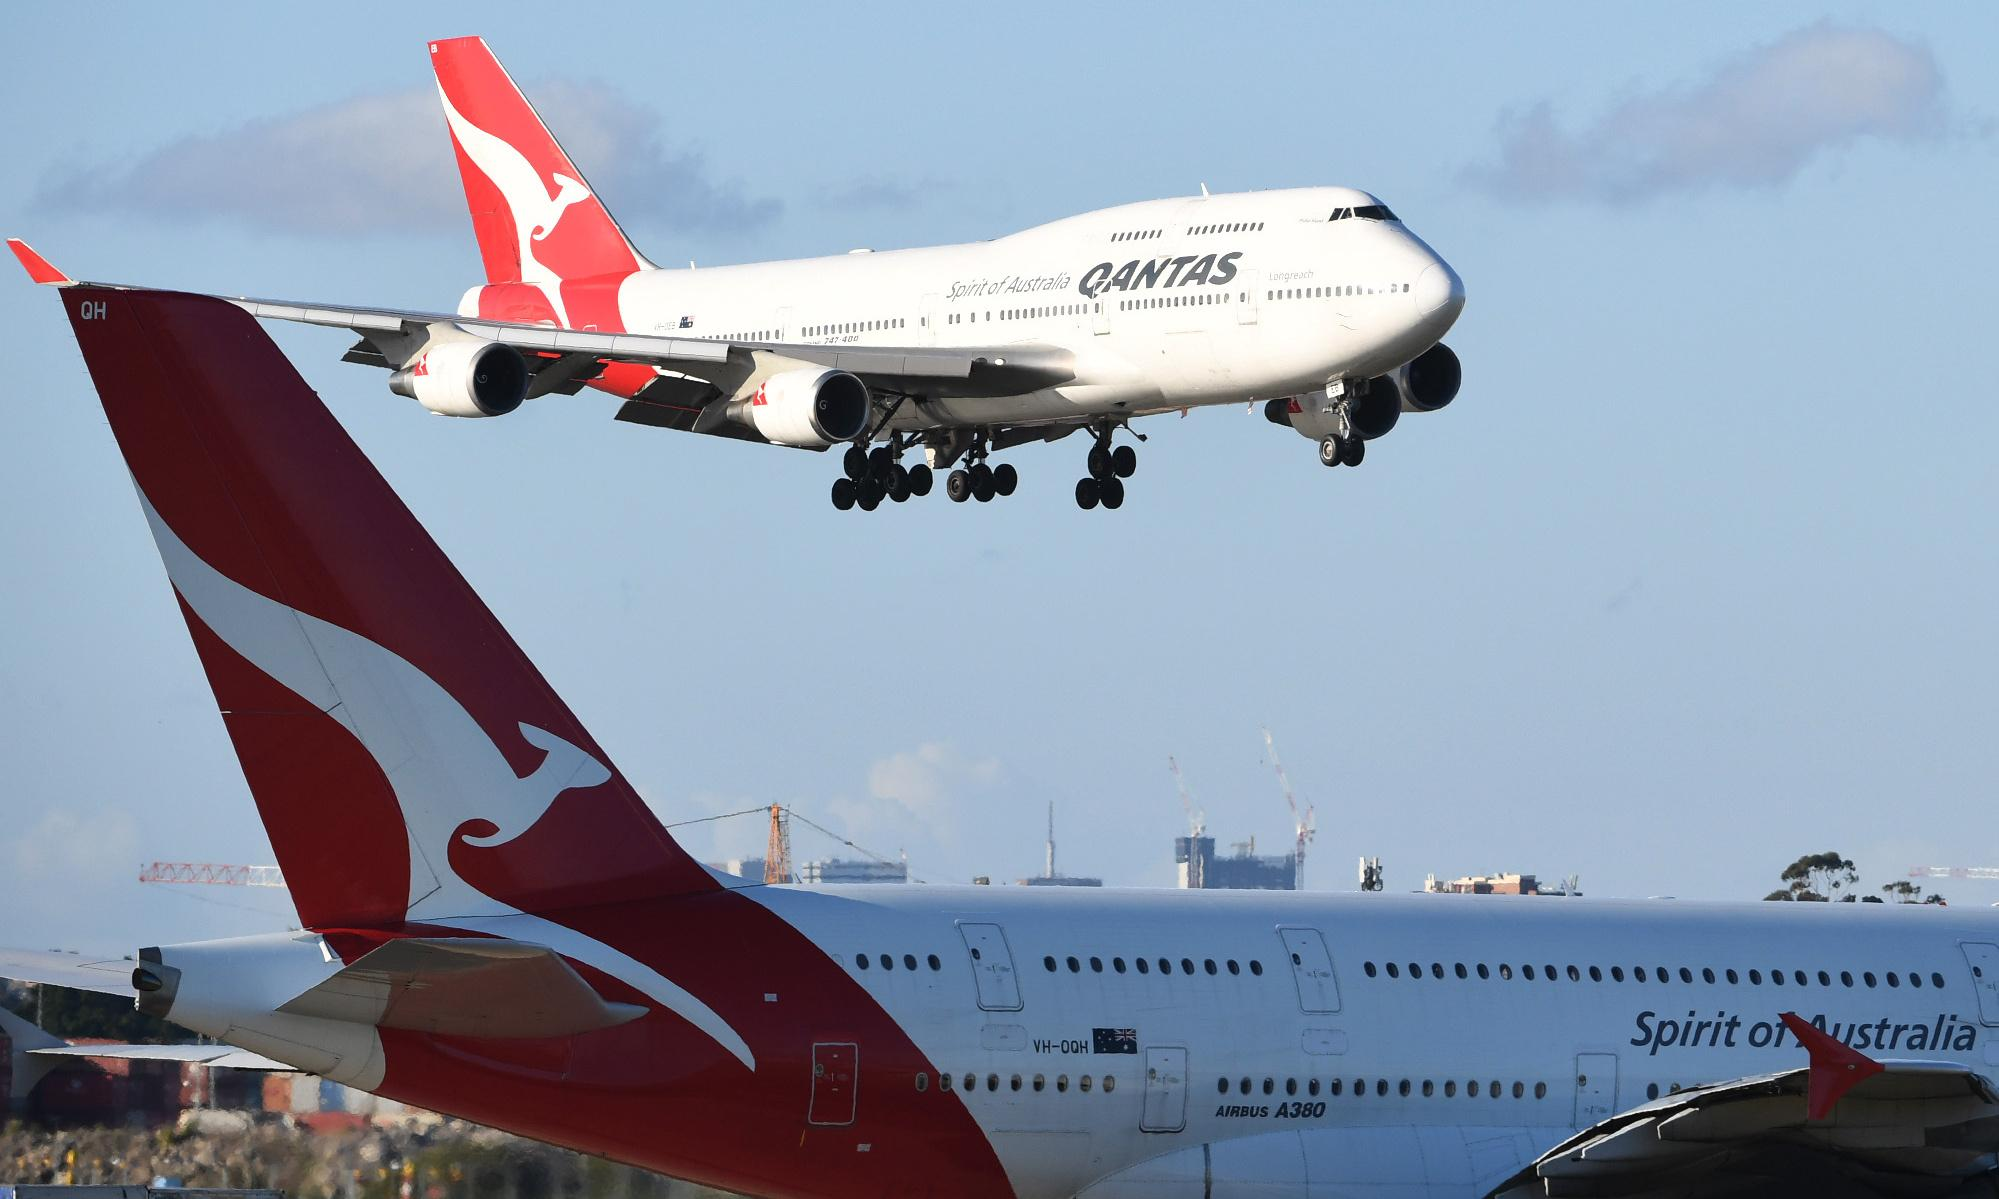 Qantas overhauls frequent flyer program, making economy cheaper